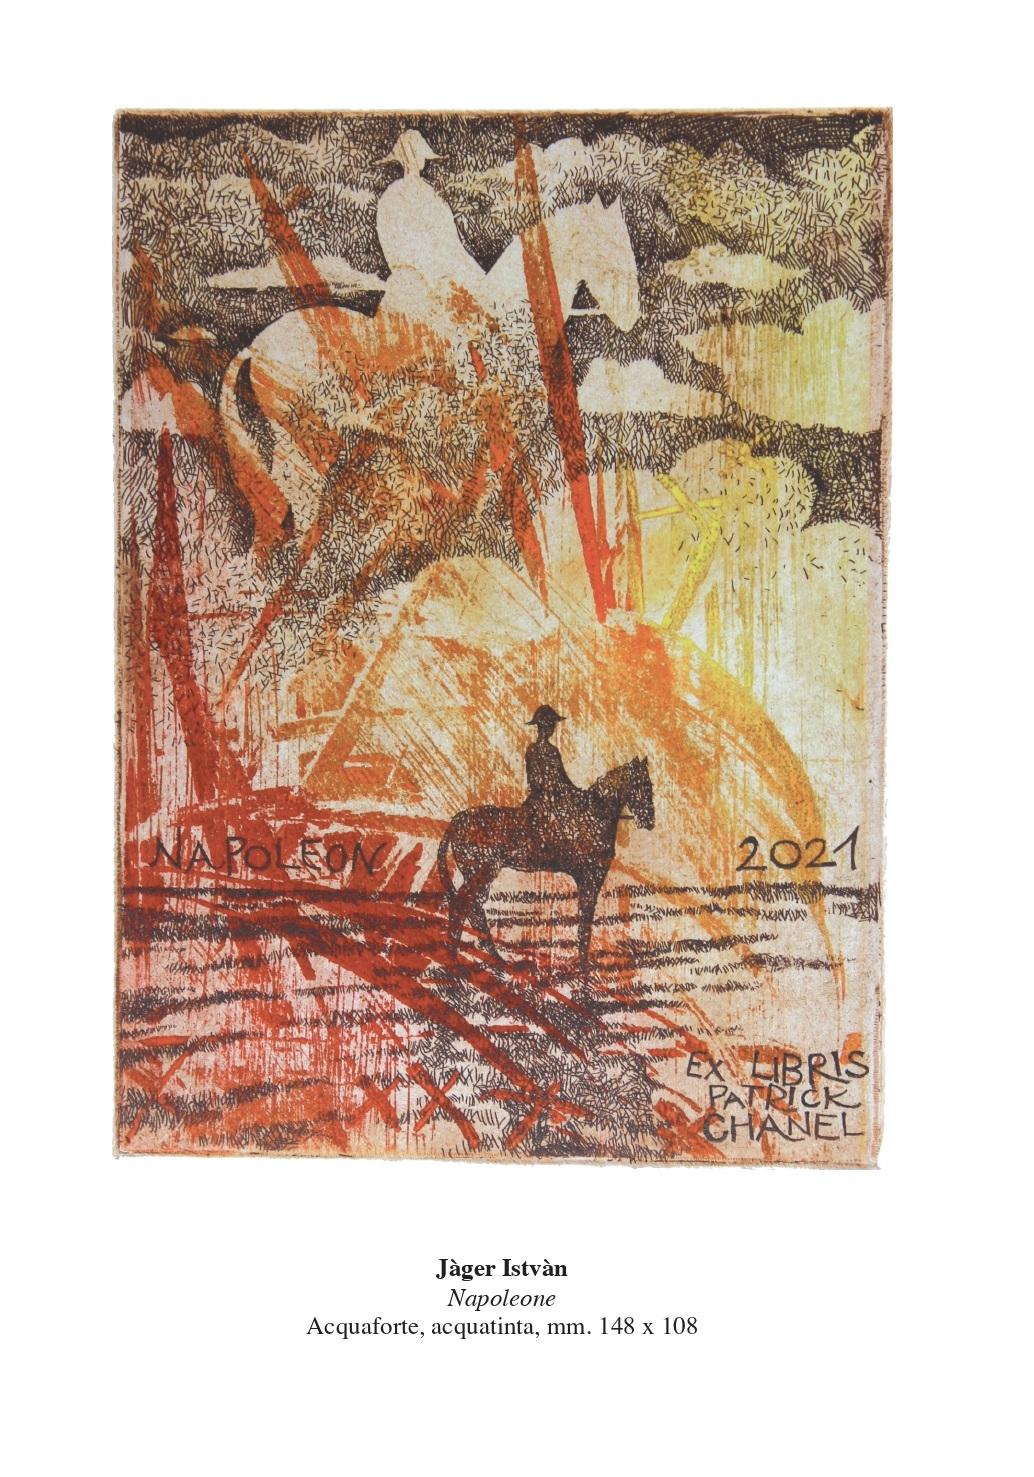 CATALOGO exlibris 2021-93_page-0001